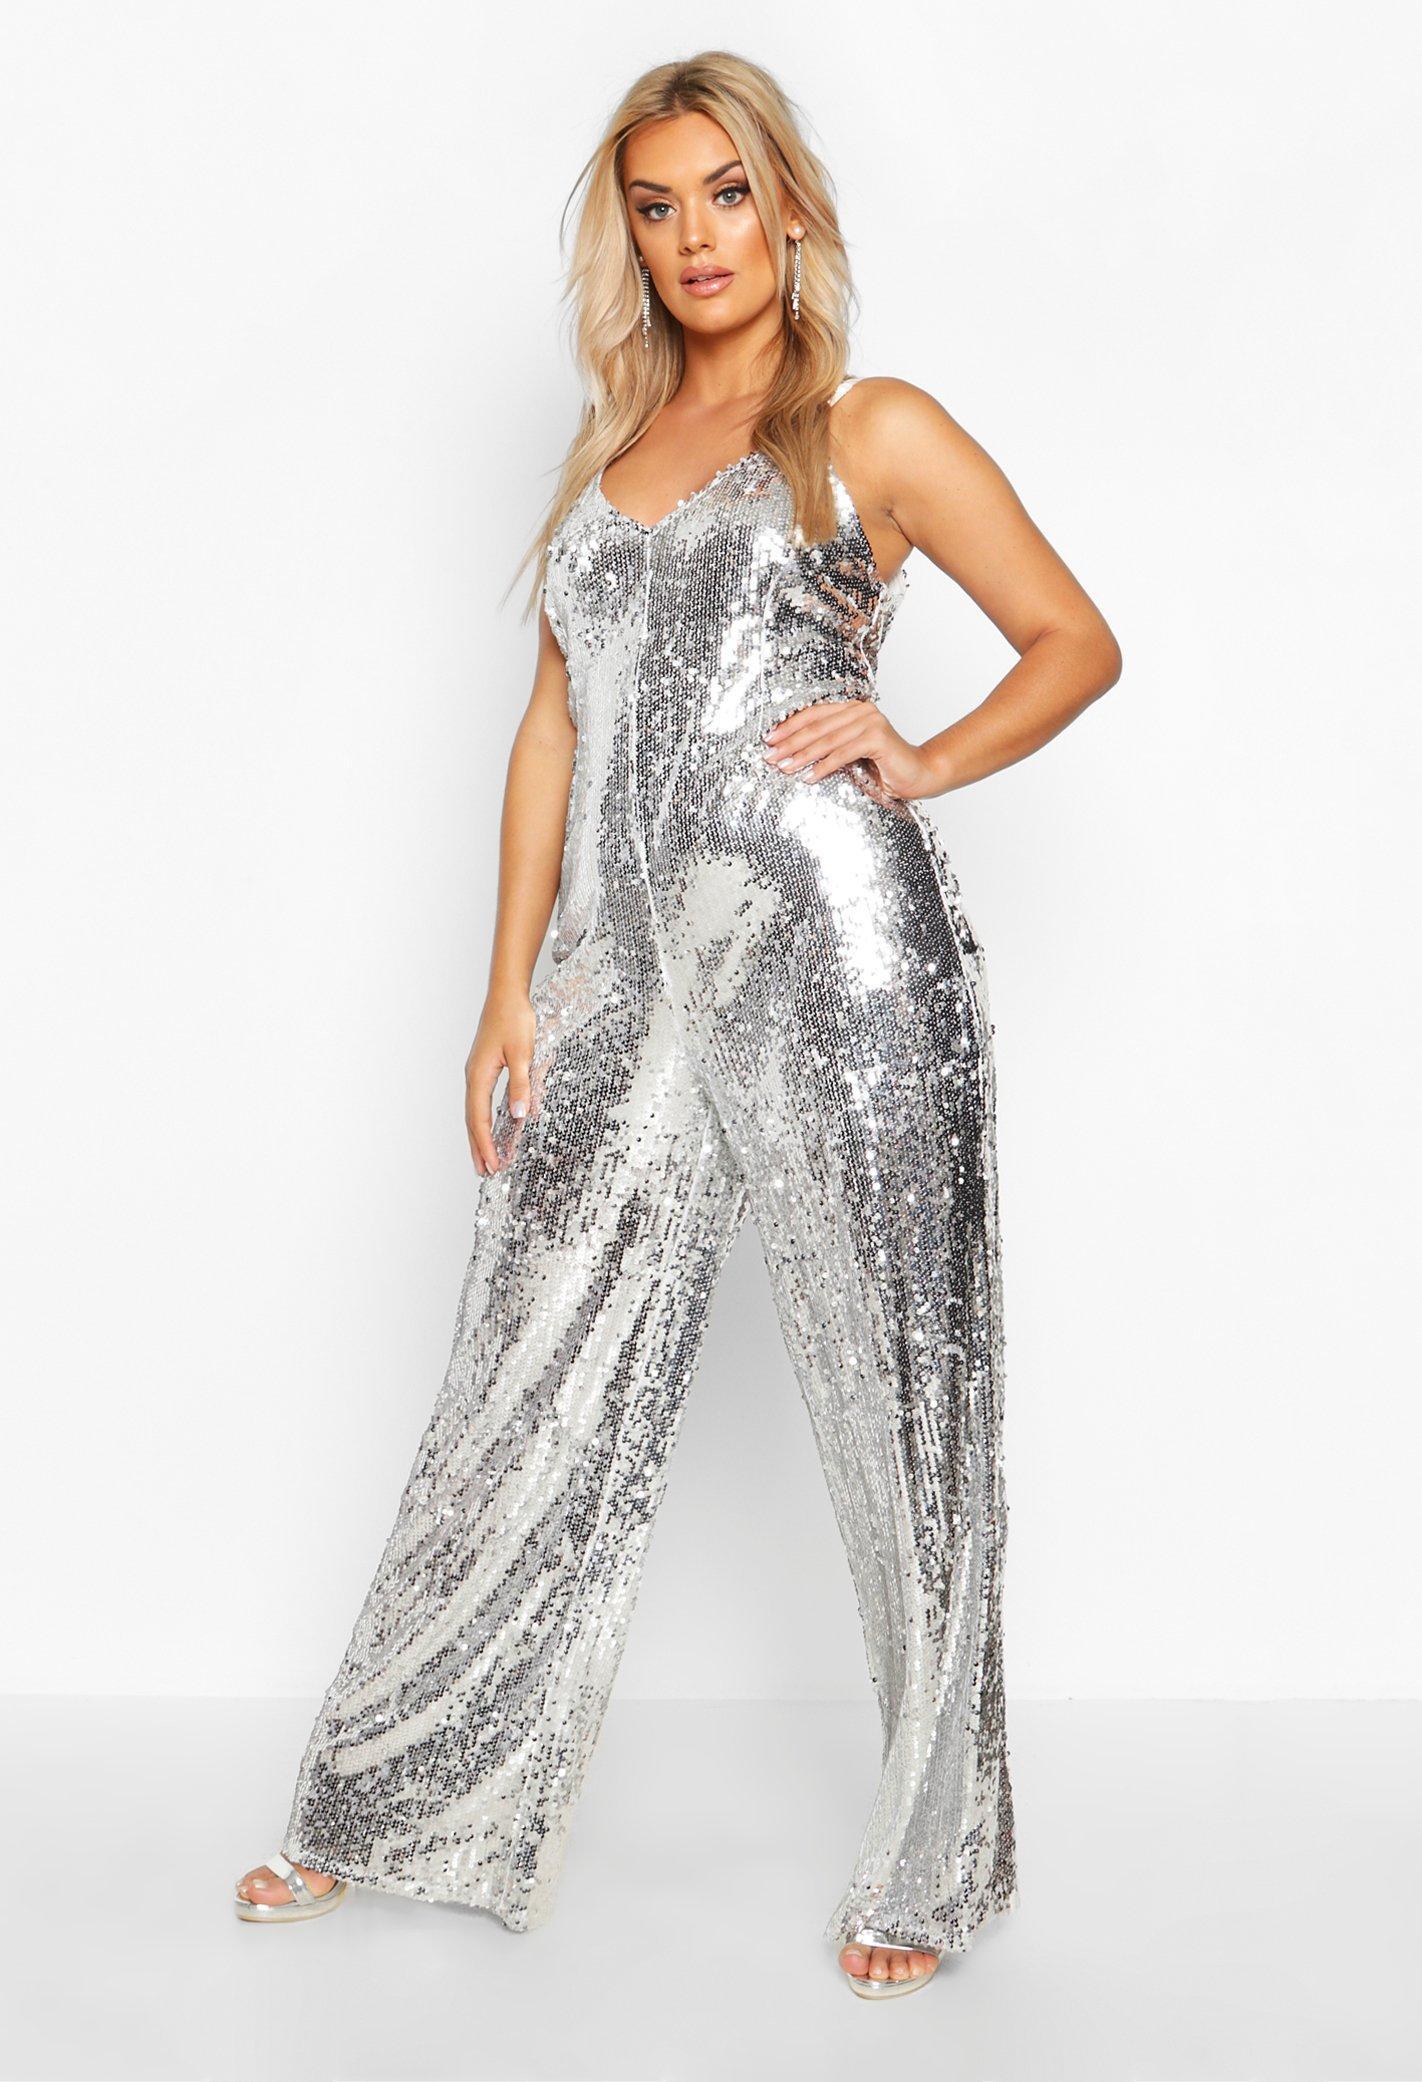 70s Clothes | Hippie Clothes & Outfits Womens Plus Sequin Strappy Wide Leg Jumpsuit - Grey - 16 $40.00 AT vintagedancer.com